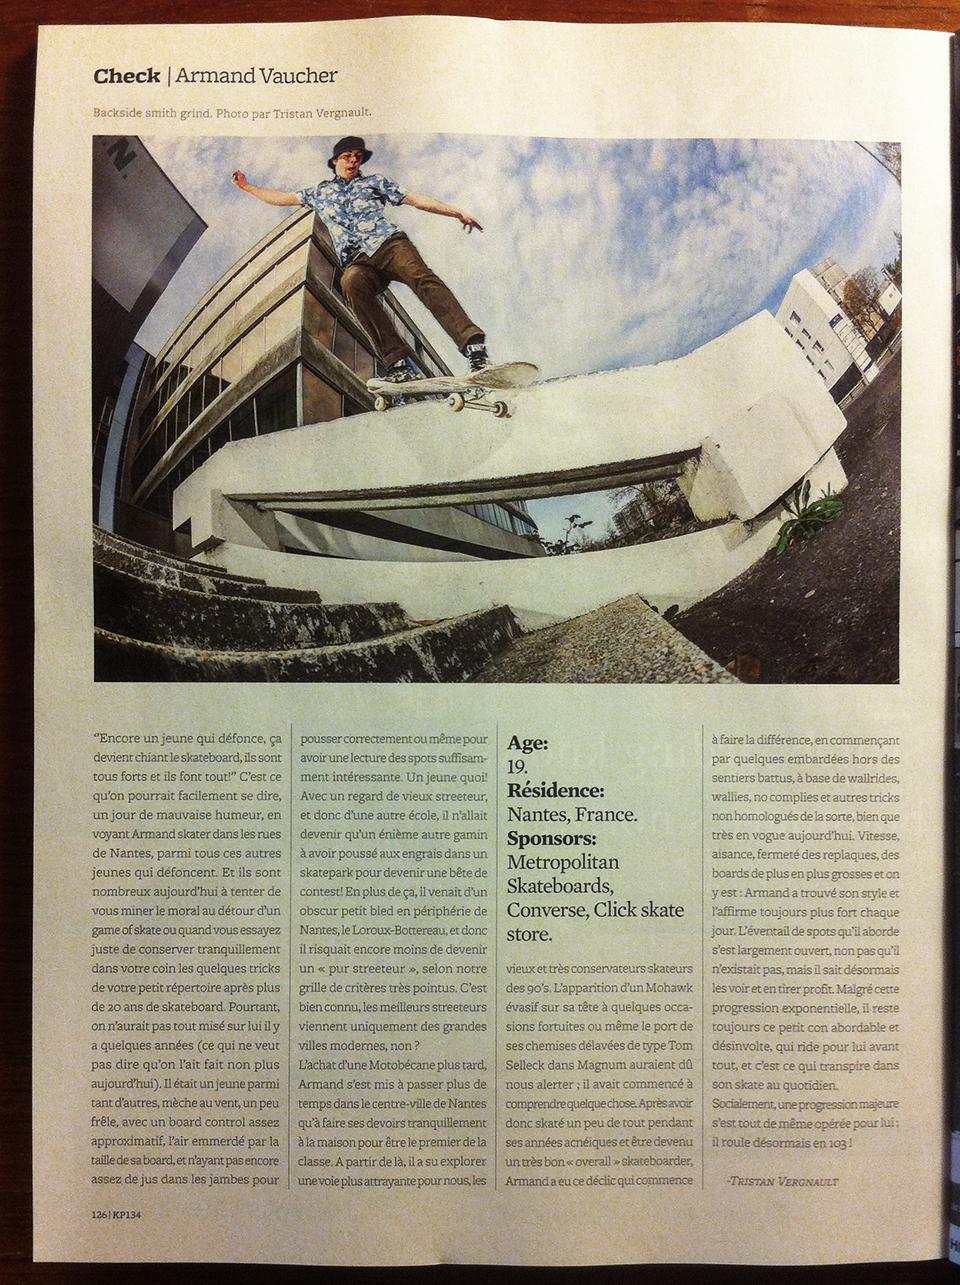 Armand_Vaucher_Kingpin_Checkout_Full_Page